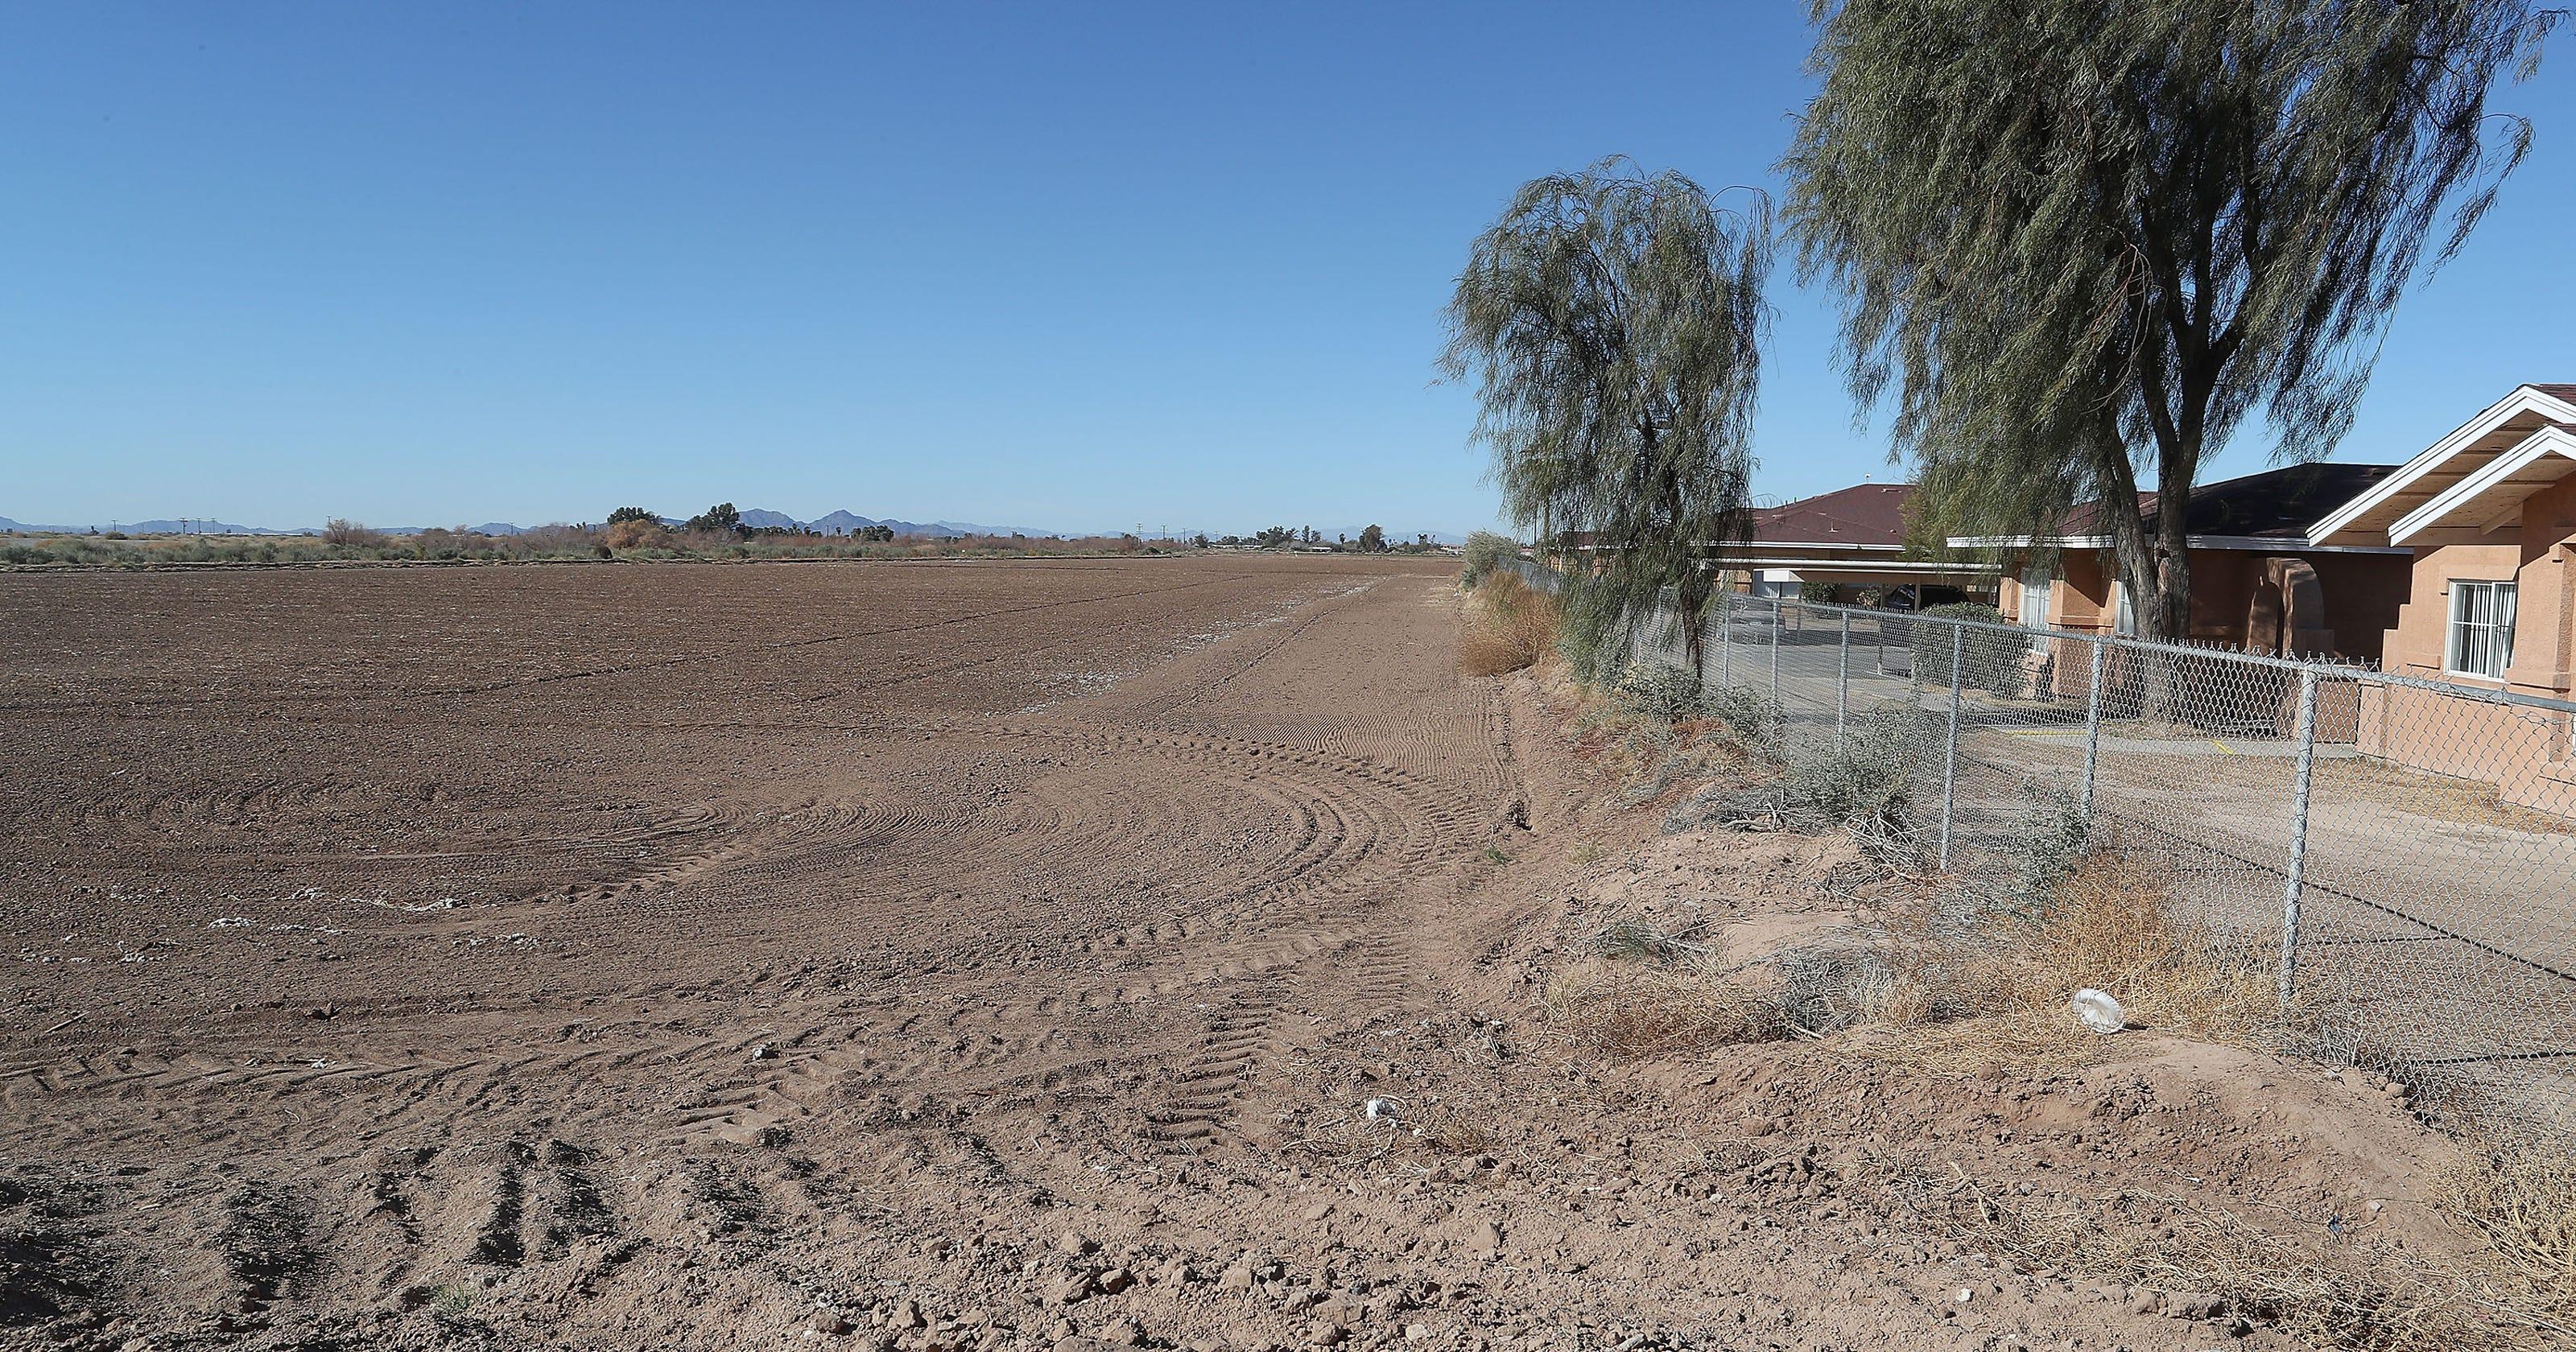 Can Marijuana Save This Dying Town On The California Arizona Border